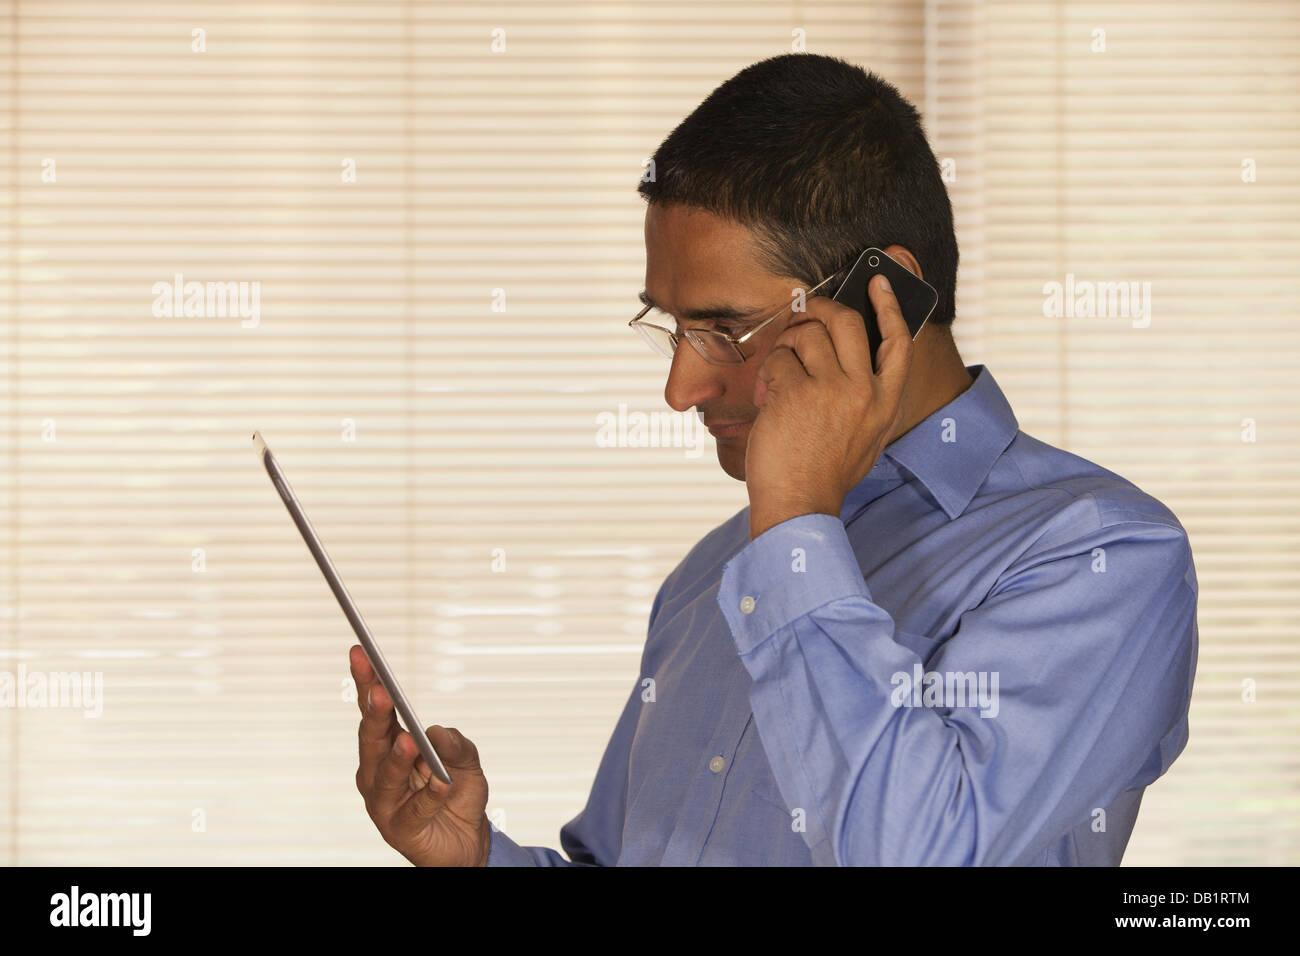 Man on Iphone looking at IPAD Stock Photo